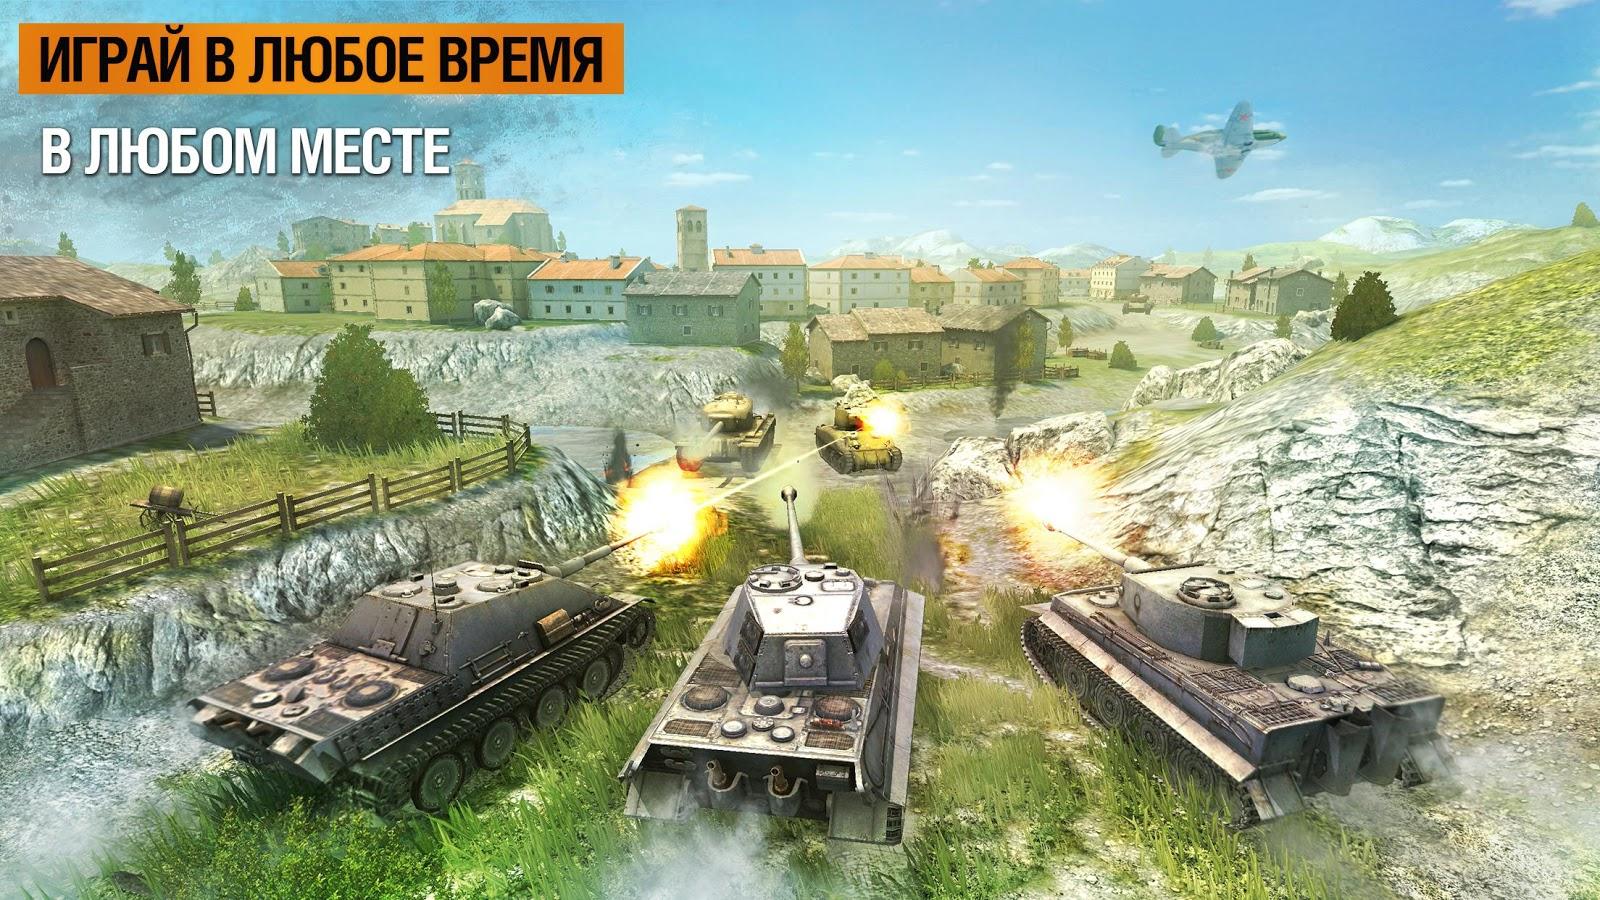 World of tanks blitz танки онлайн теперь на андроиде!